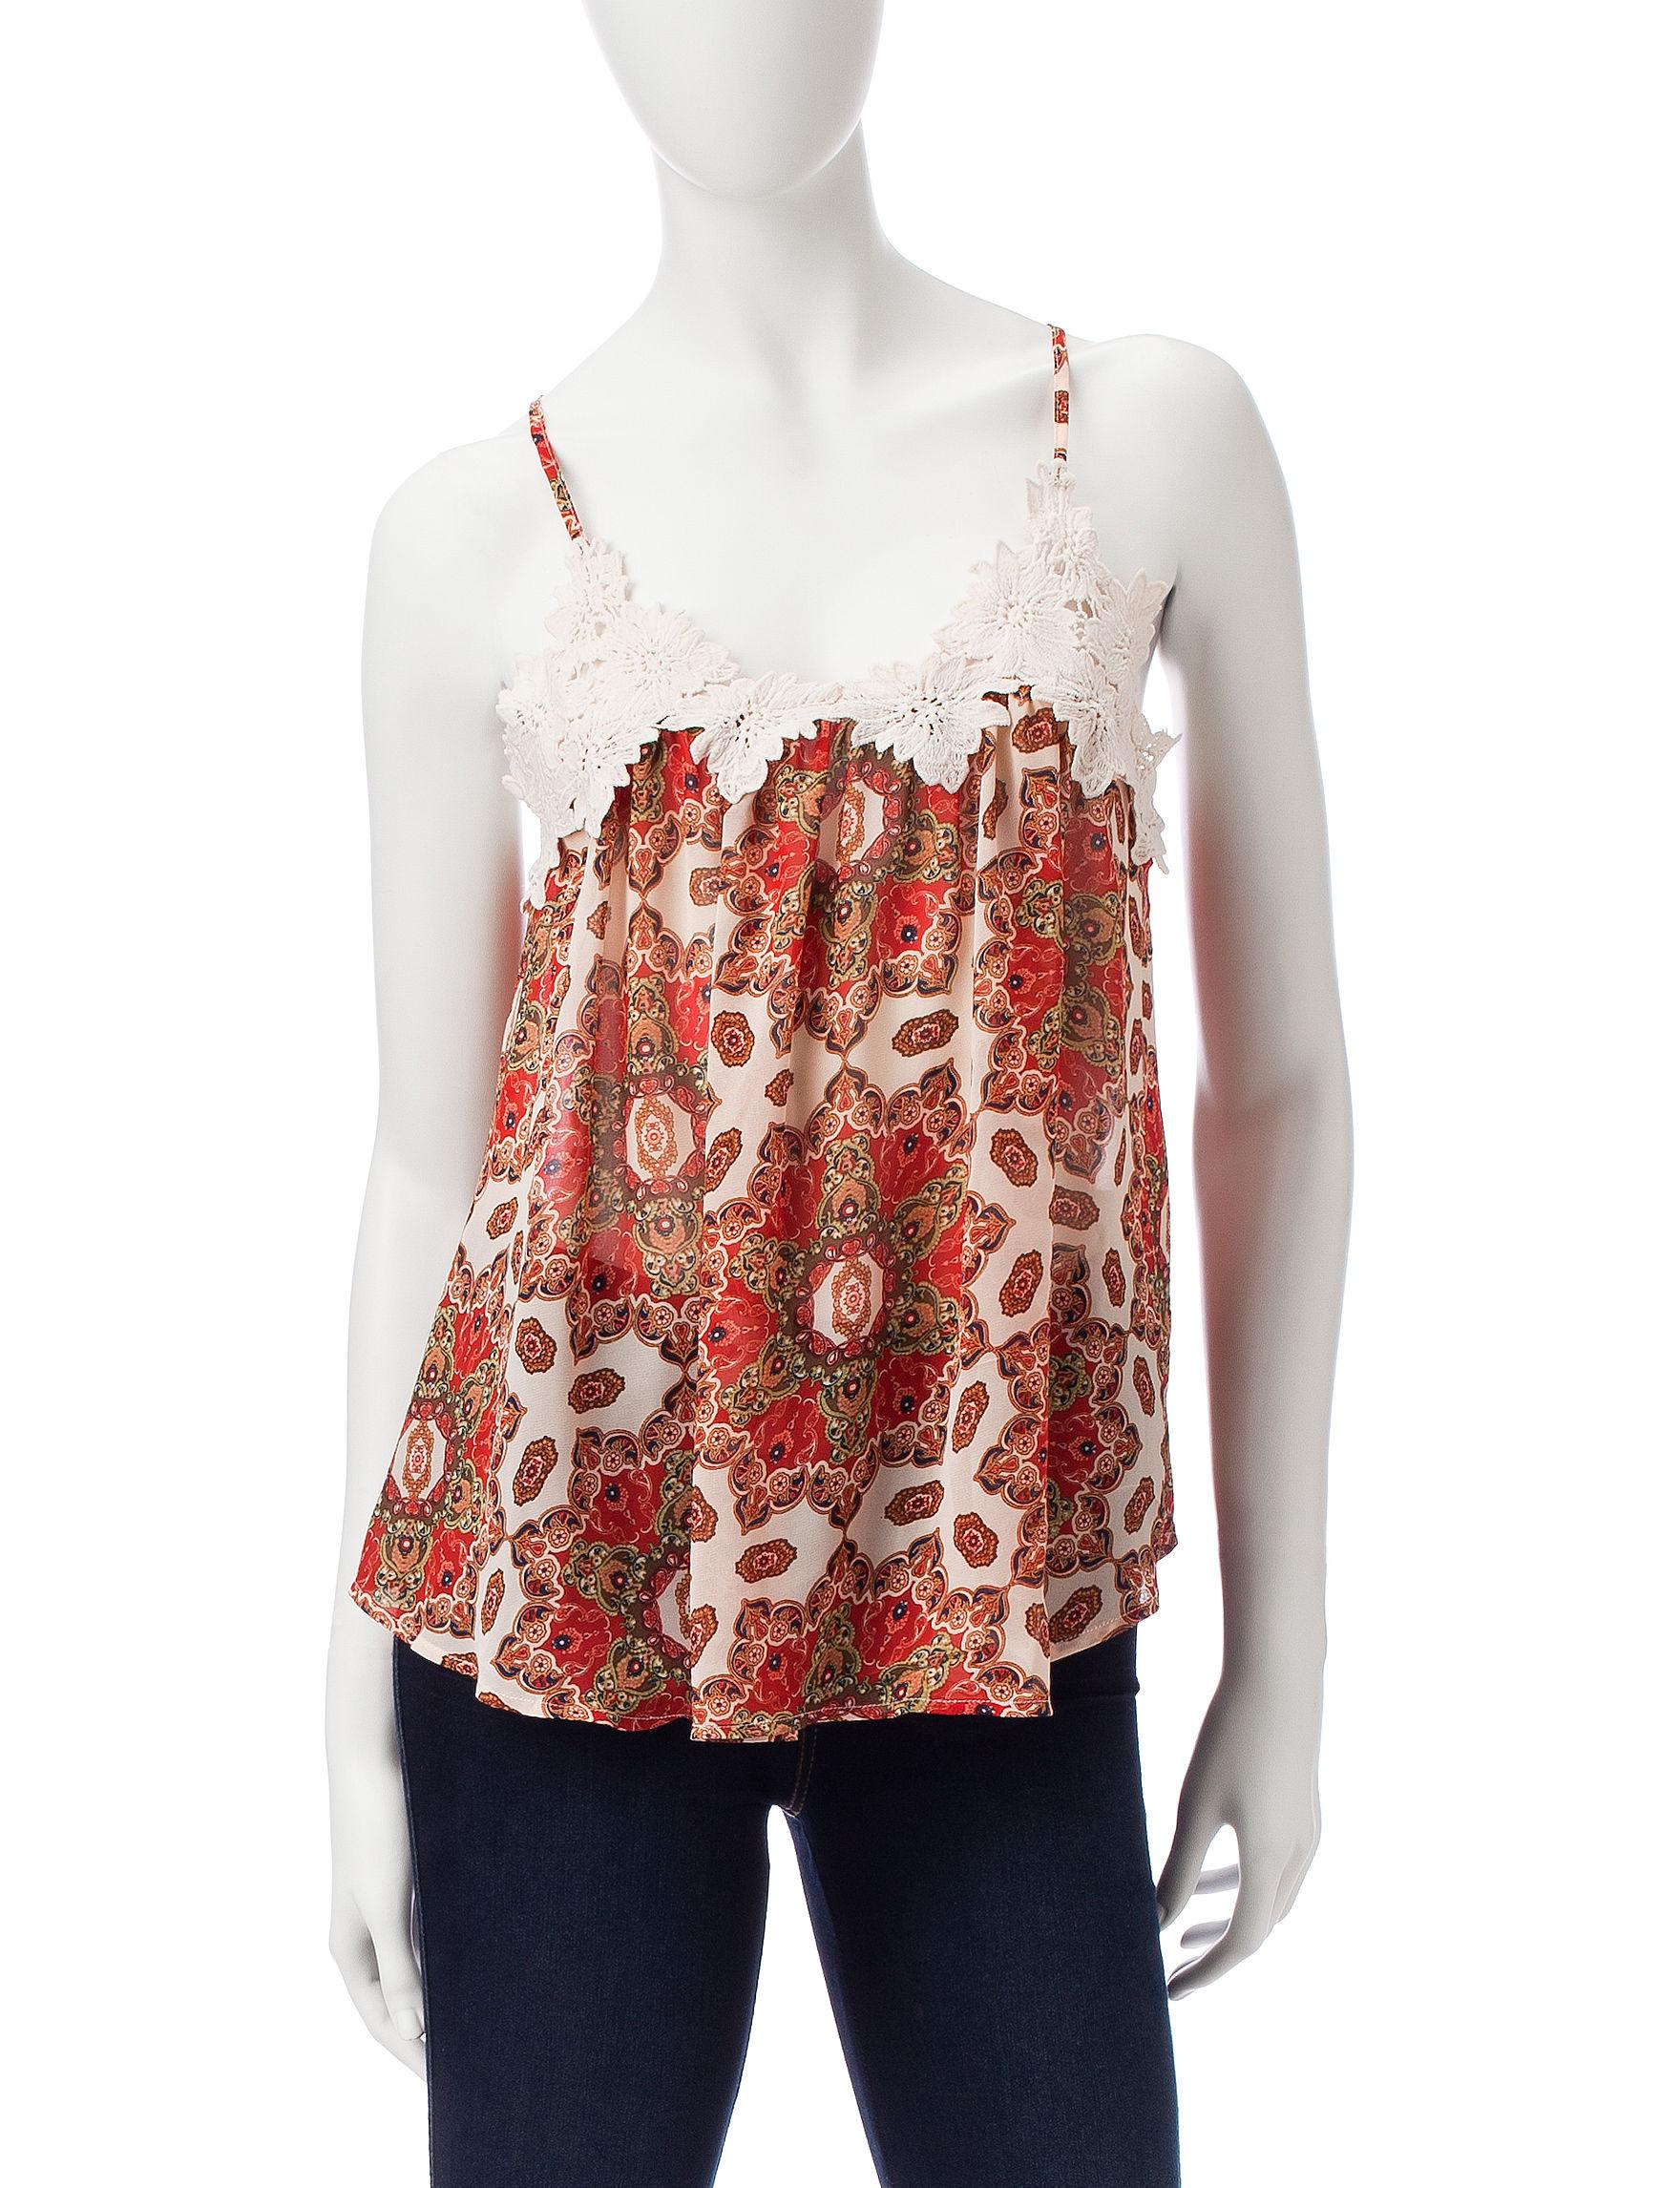 Taylor & Sage Rust Shirts & Blouses Tees & Tanks